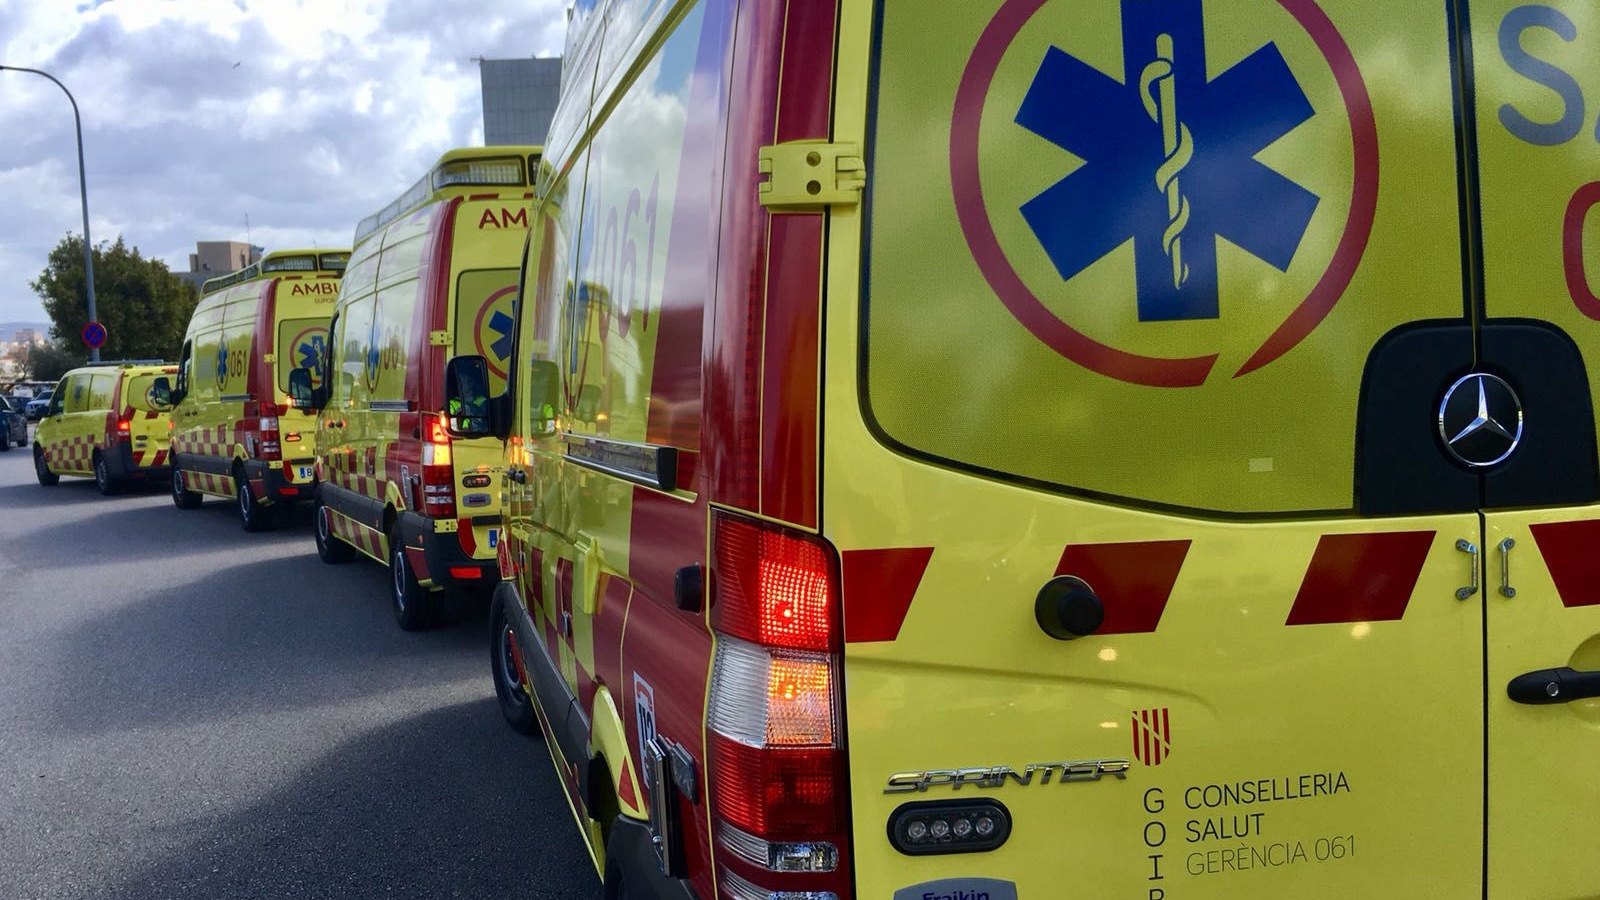 Ambulancias para sant Josep (1)